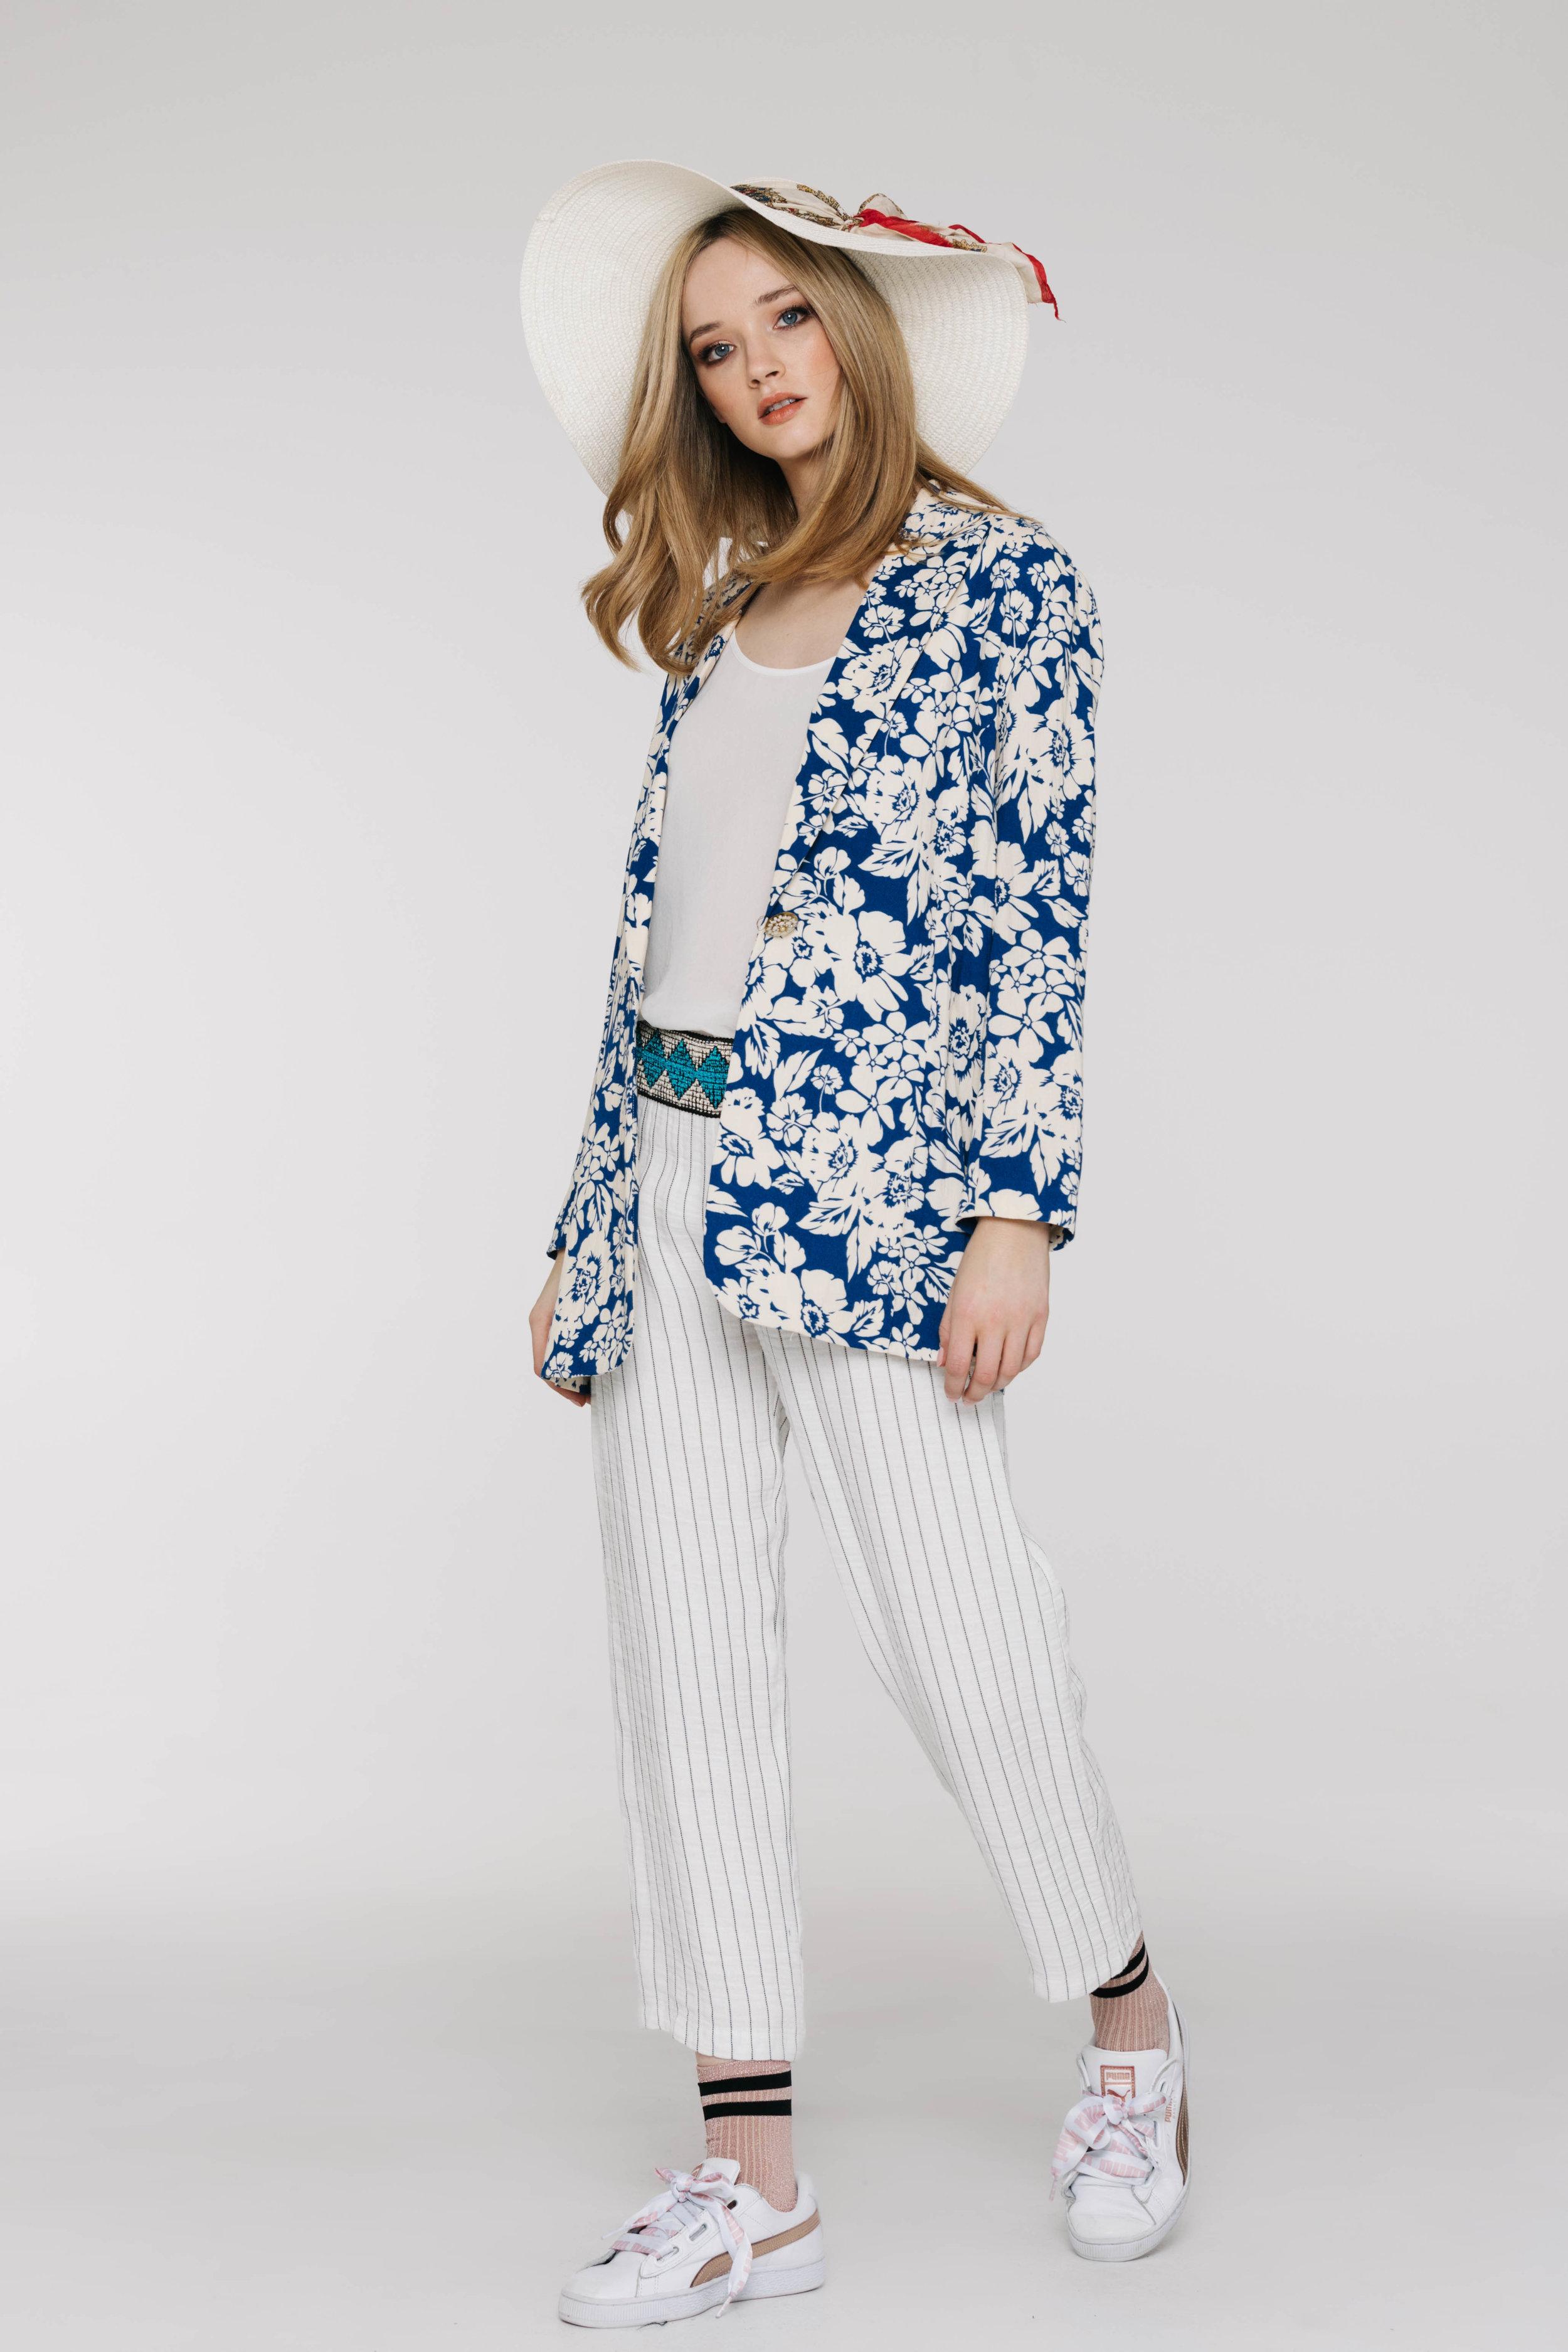 Benatar Jacket 6487N Jillian Blue, Cullotte 5642N Amalfi Stripe Ivory